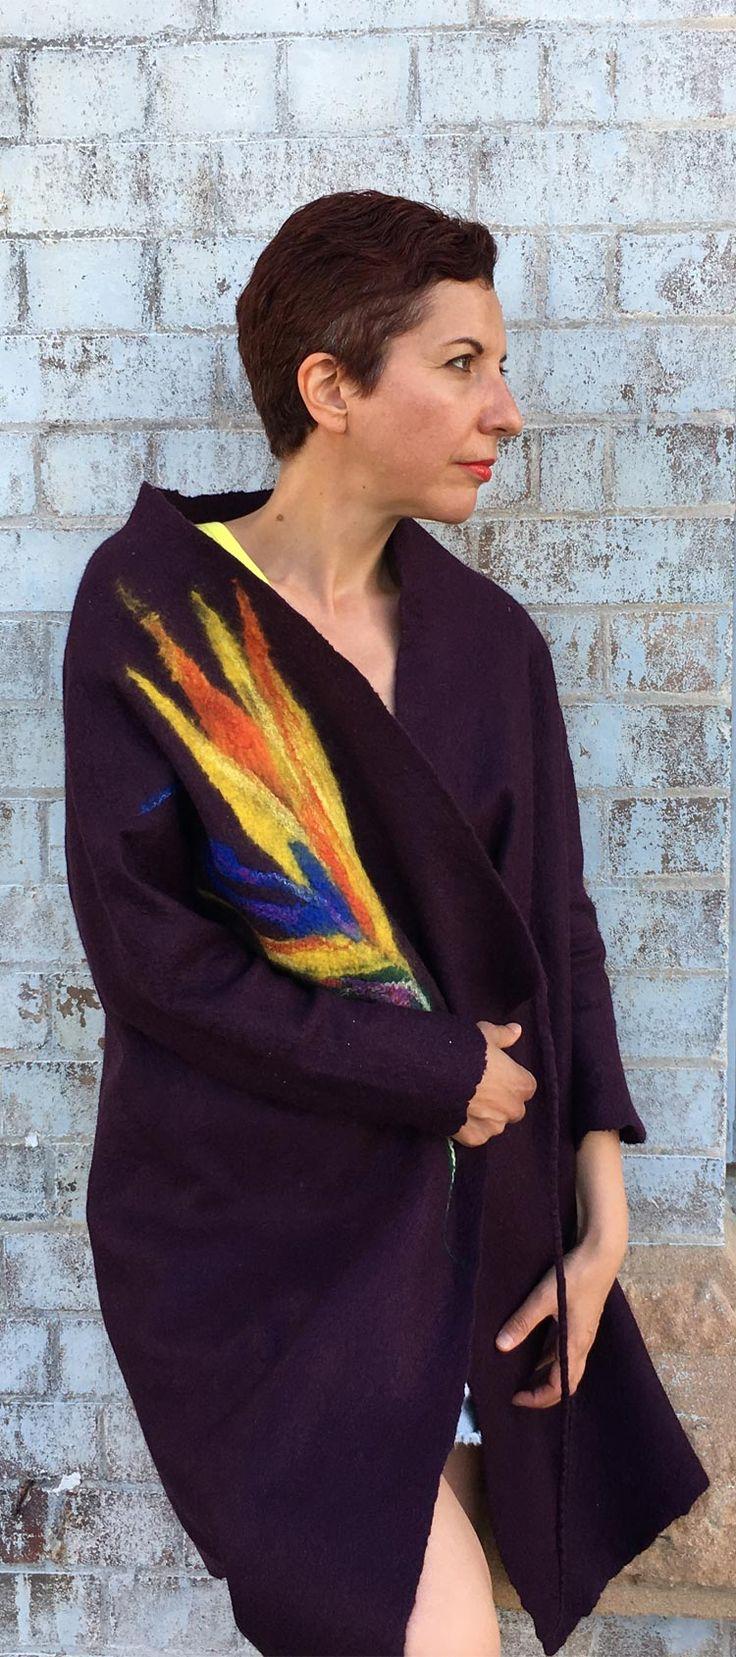 Fashion summer style wearable coat by Vera Alexanderova. #wearables #ecofriendly #ecofashion #wool #handmade #style #fashion #felt #coat